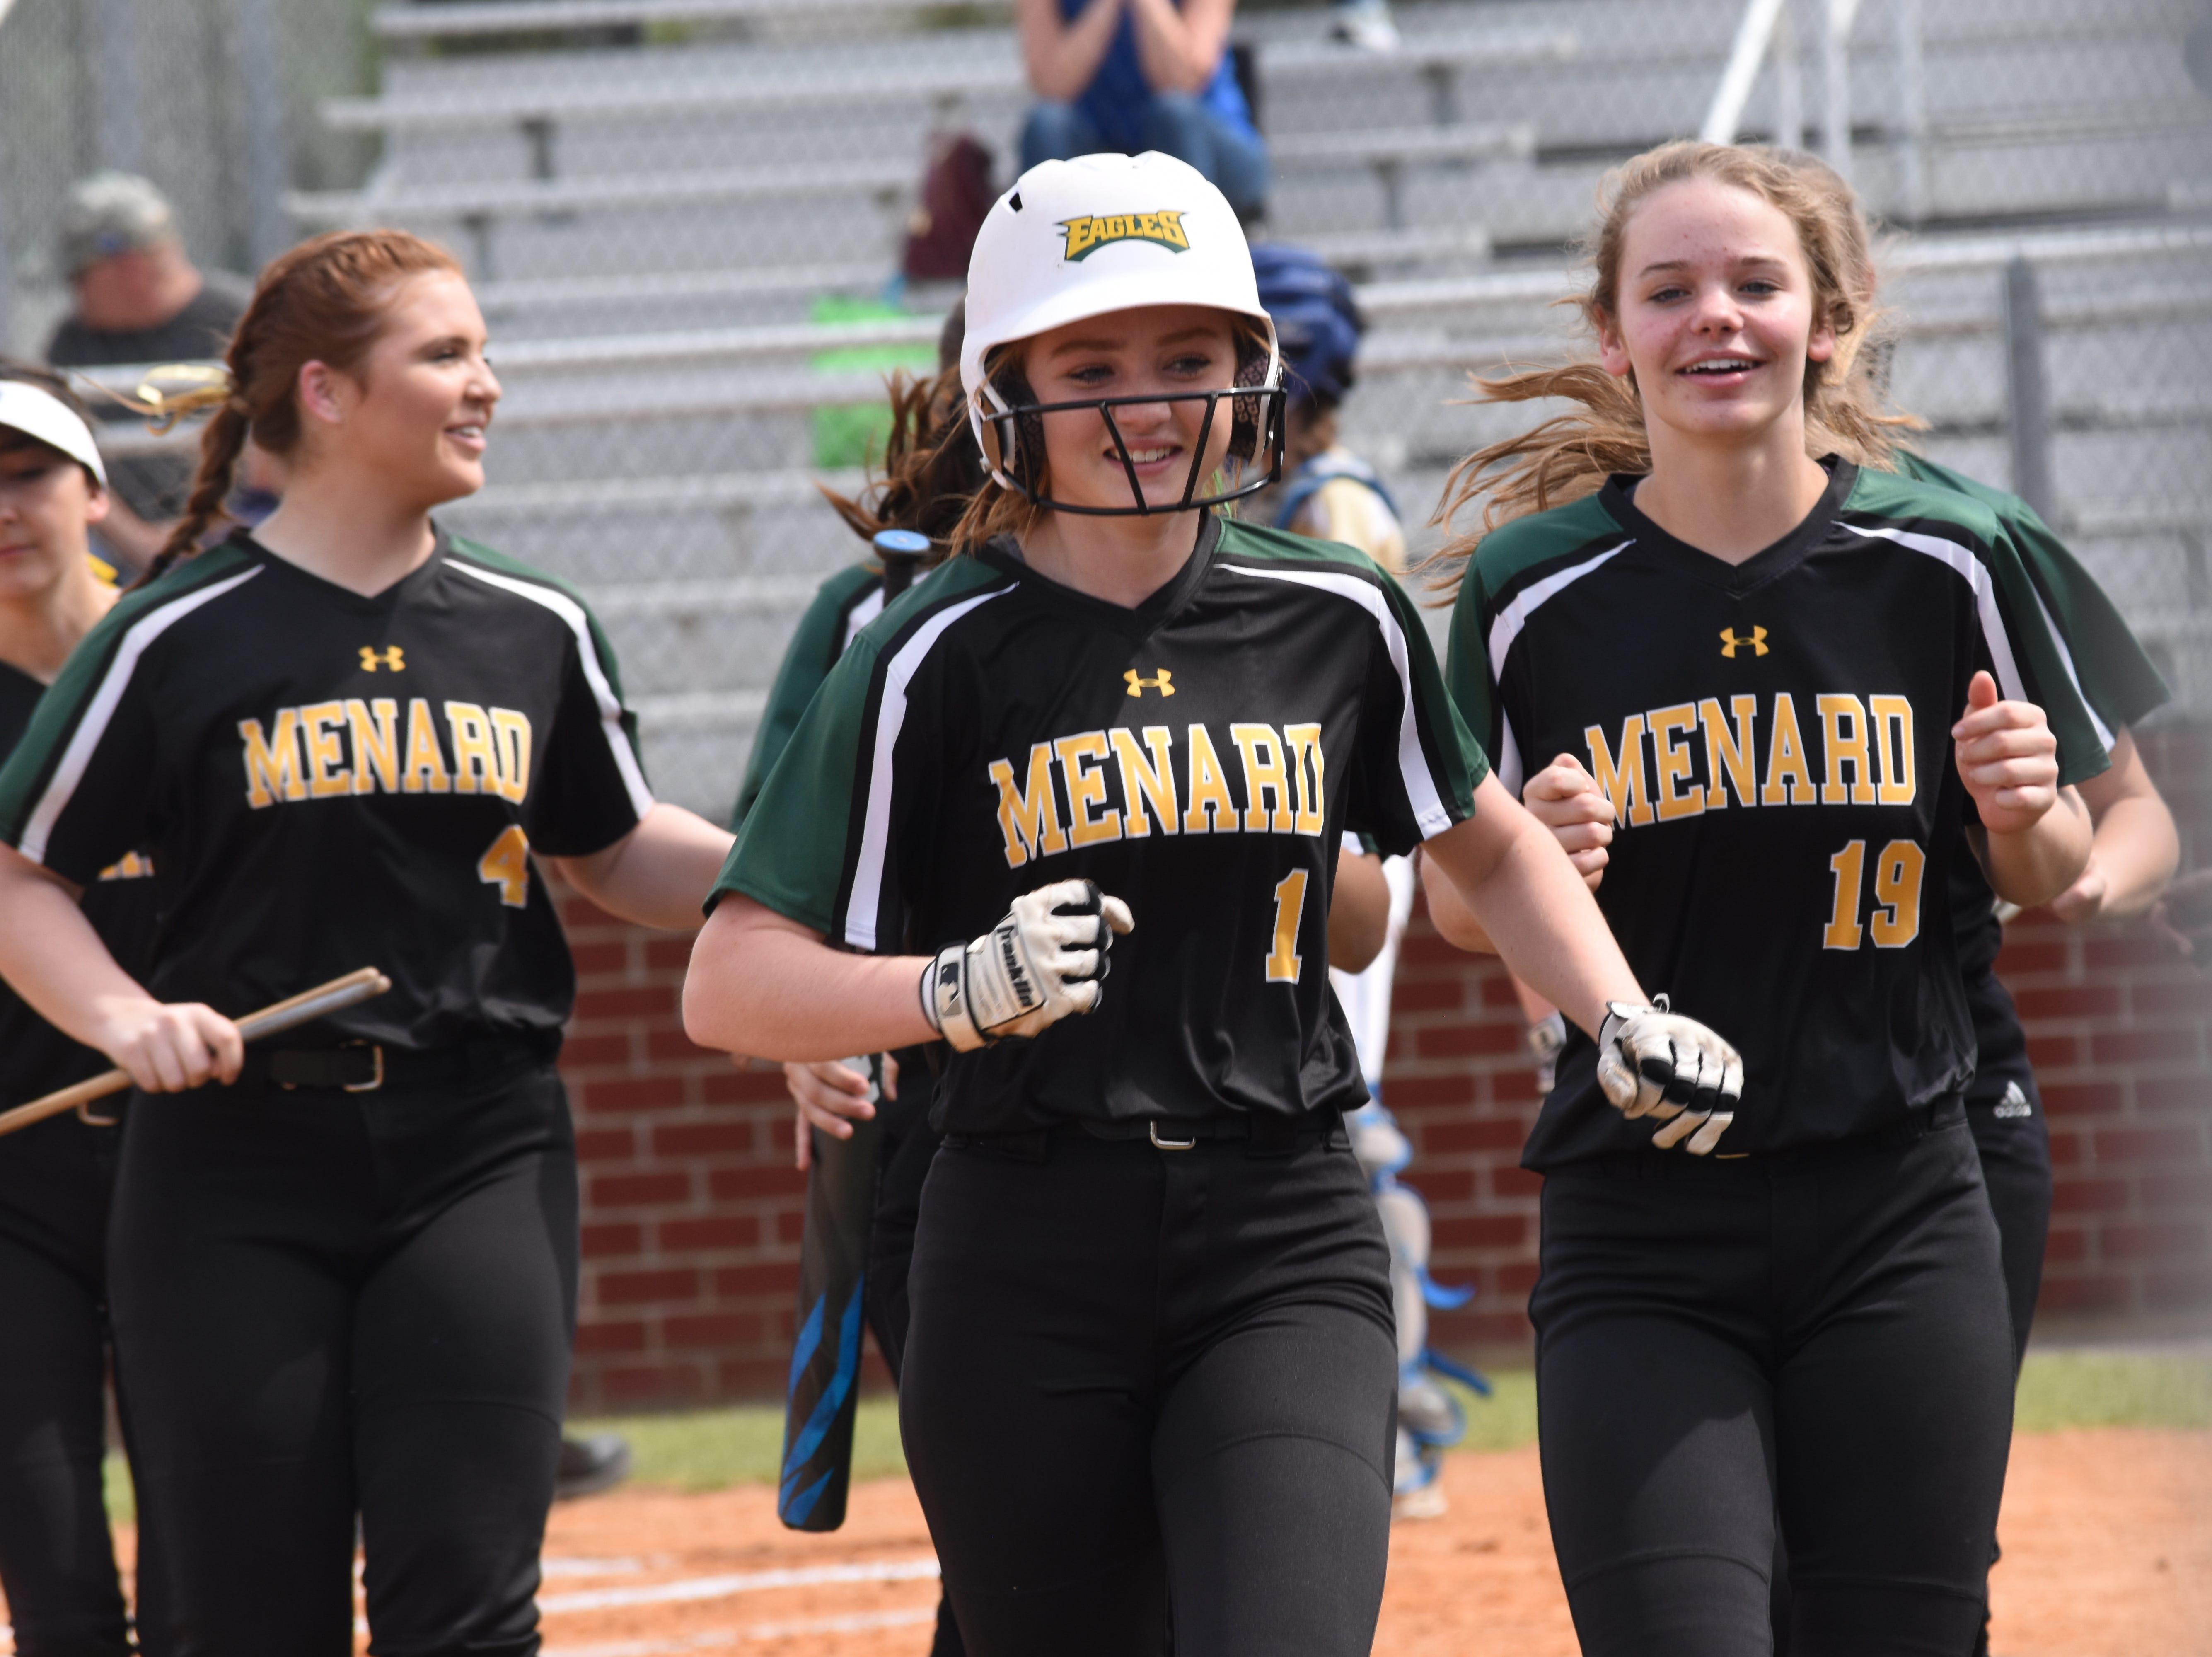 Holy Savior Menard High School hosted Sacred Heart High School of Ville Platte Wednesday, April 3, 2019. Menard won 12-11.